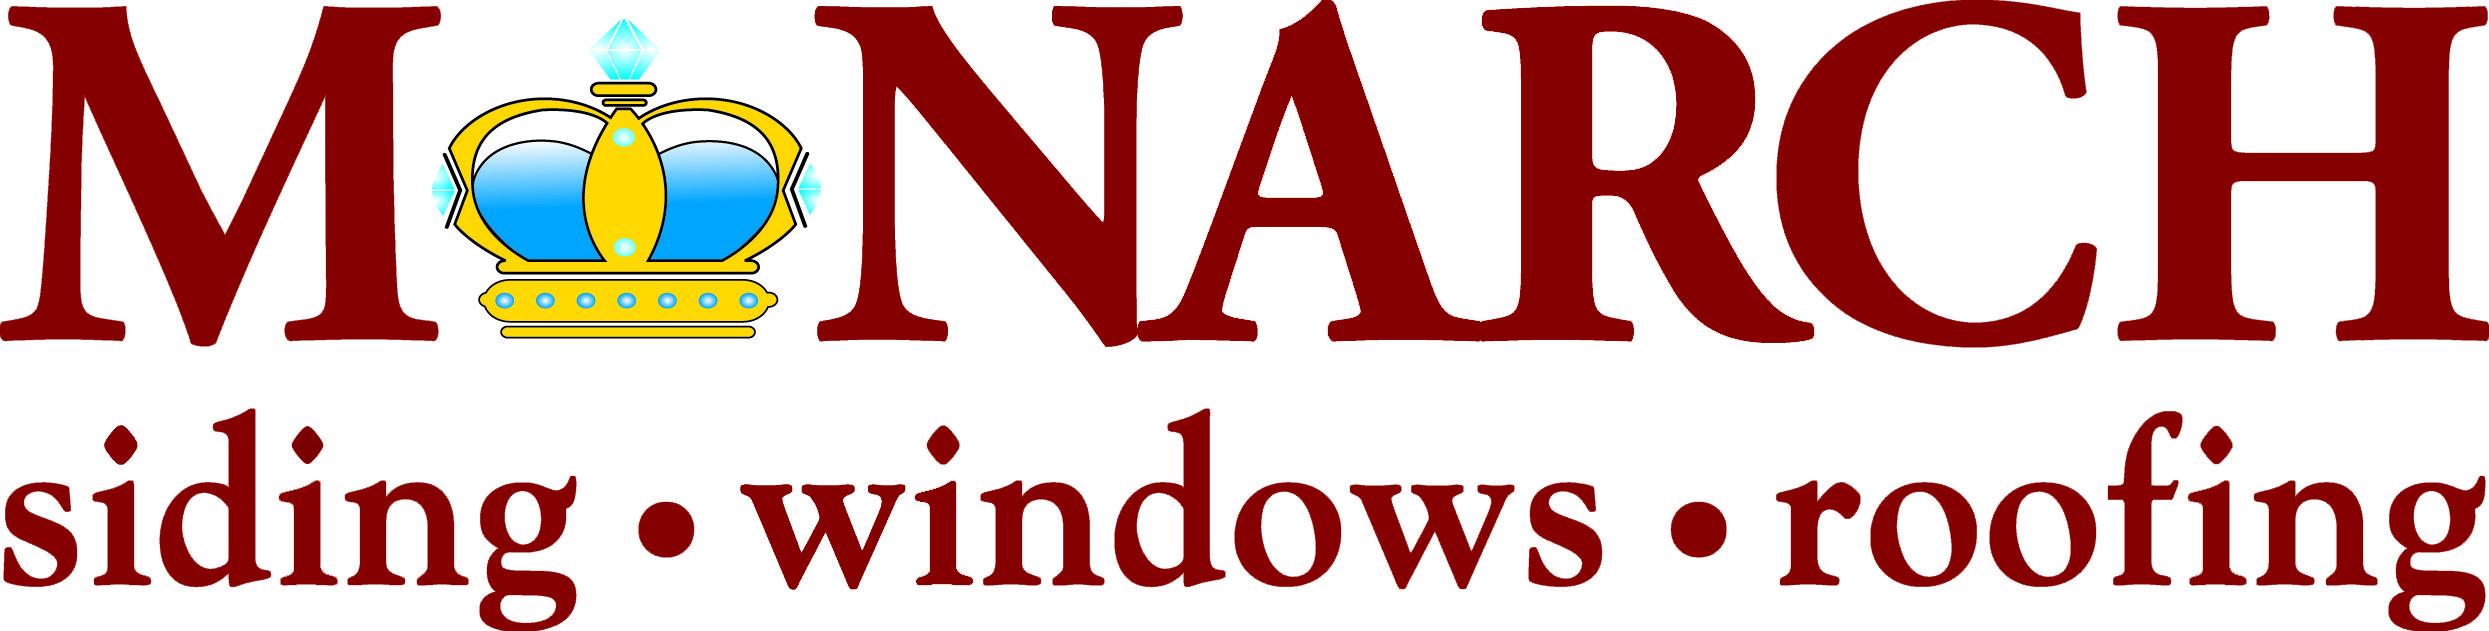 Monarch Siding, Windows, & Roofing Inc - Logo